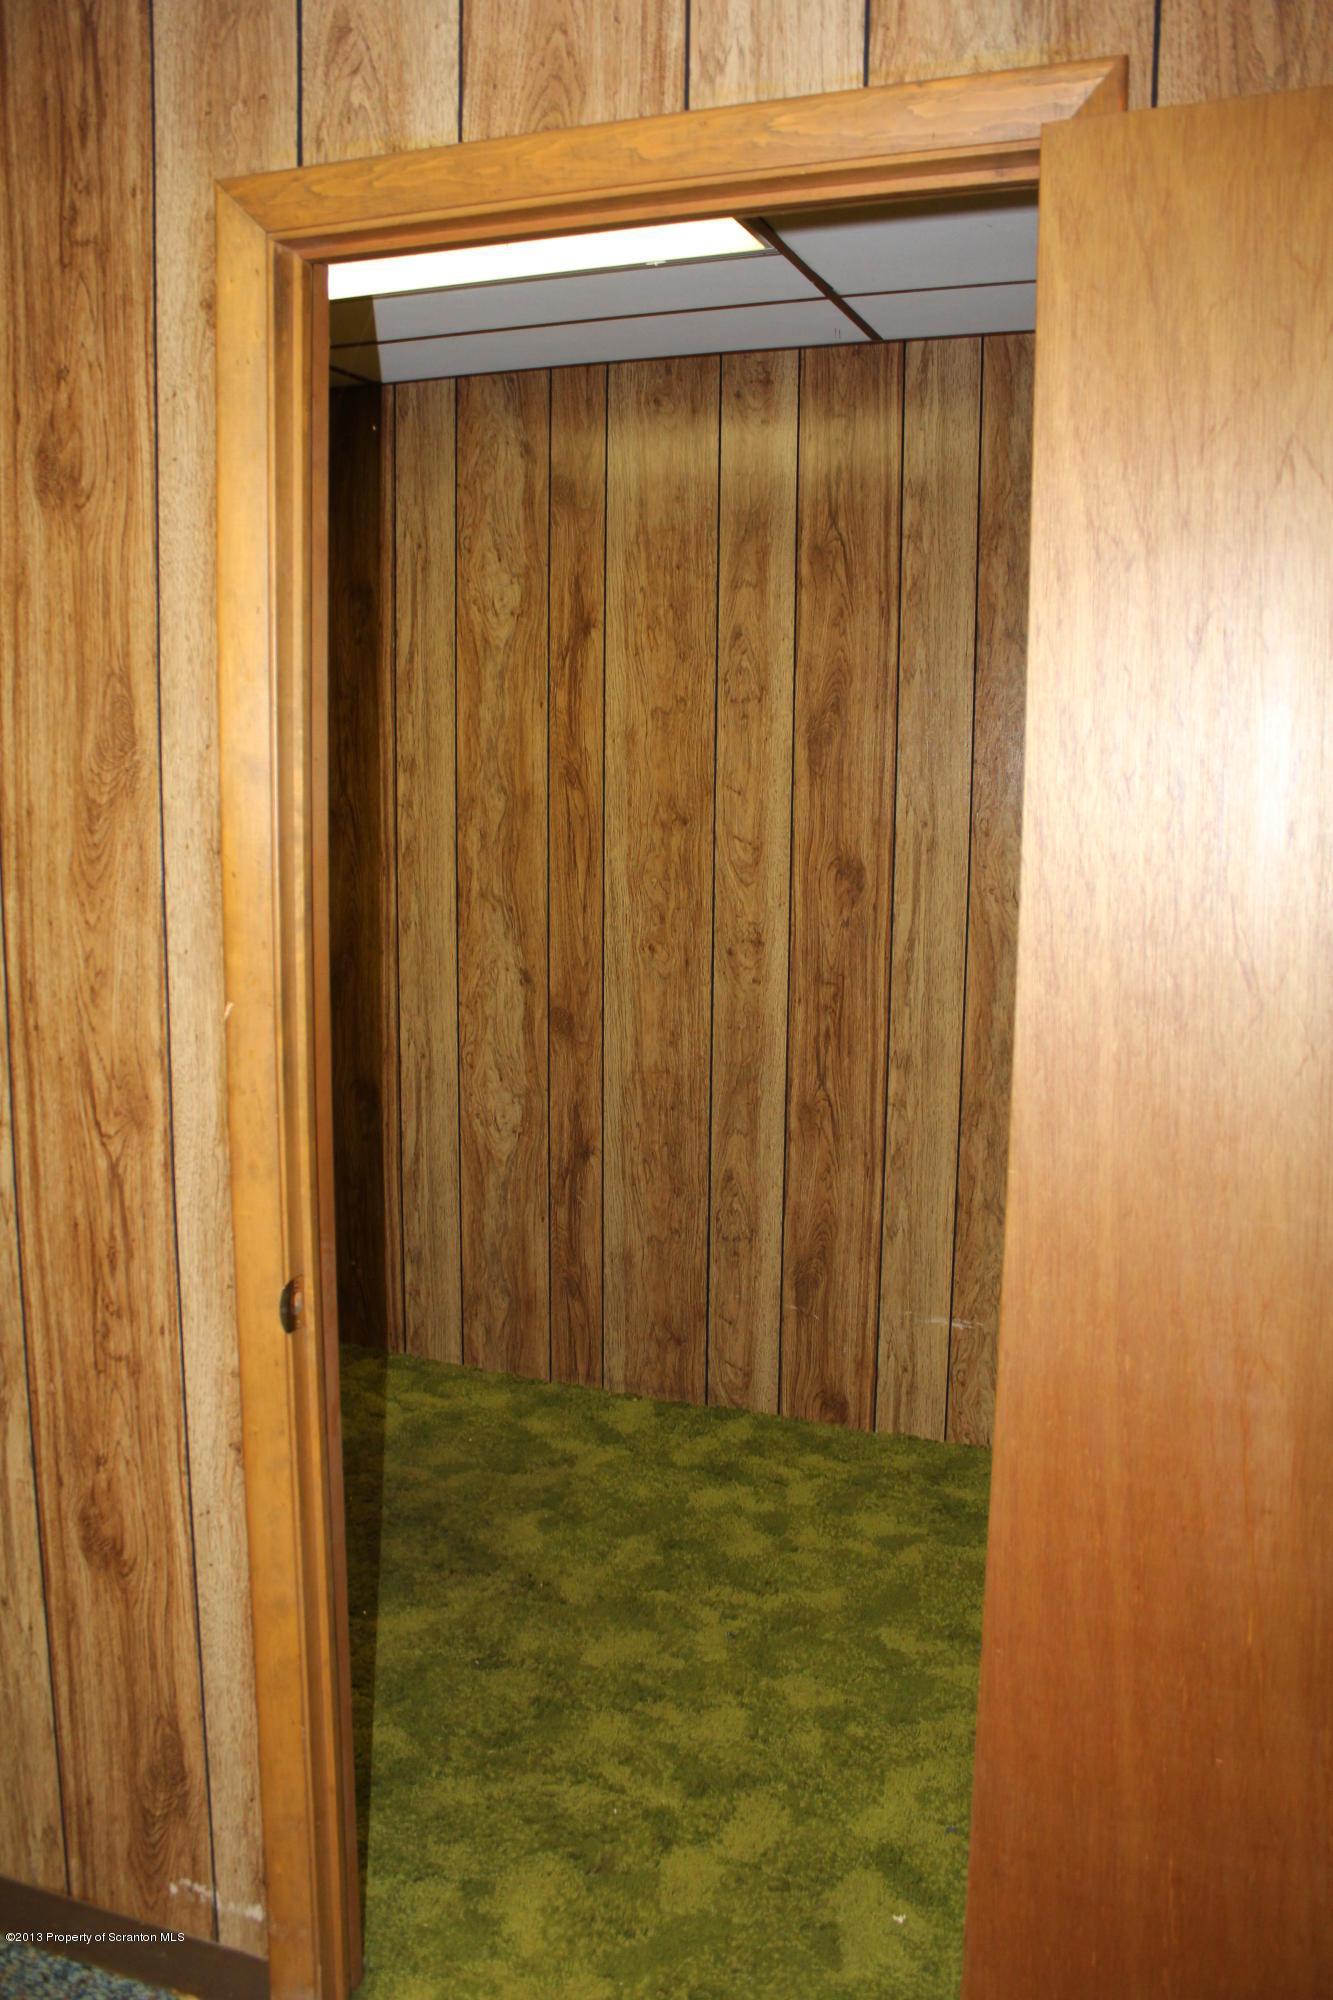 545 MAIN Ave, Scranton, Pennsylvania 18504, ,3 BathroomsBathrooms,Commercial,For Sale,MAIN,13-3622